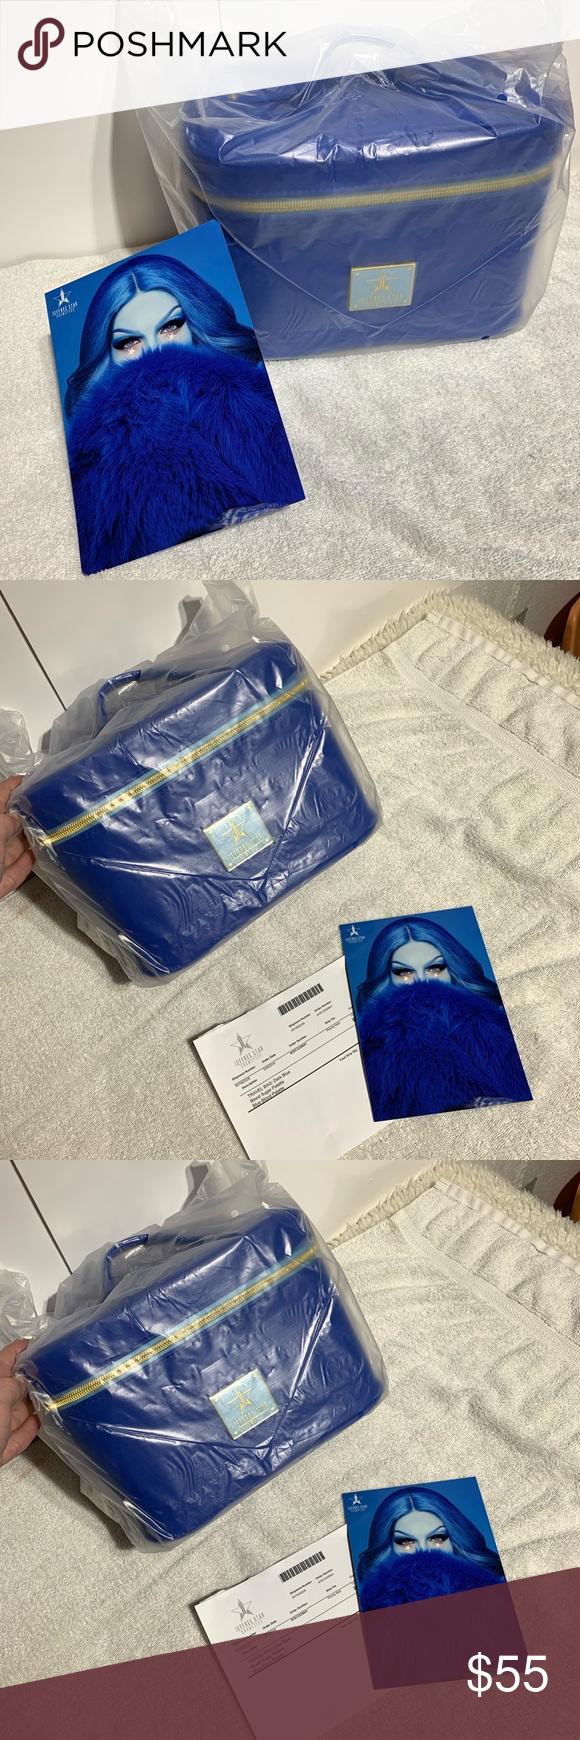 29512524a4fa40 Jeffree Star Royal Blue Makeup Bag 💙 Jeffree Star Royal Blue Make Up Bag  💙 *